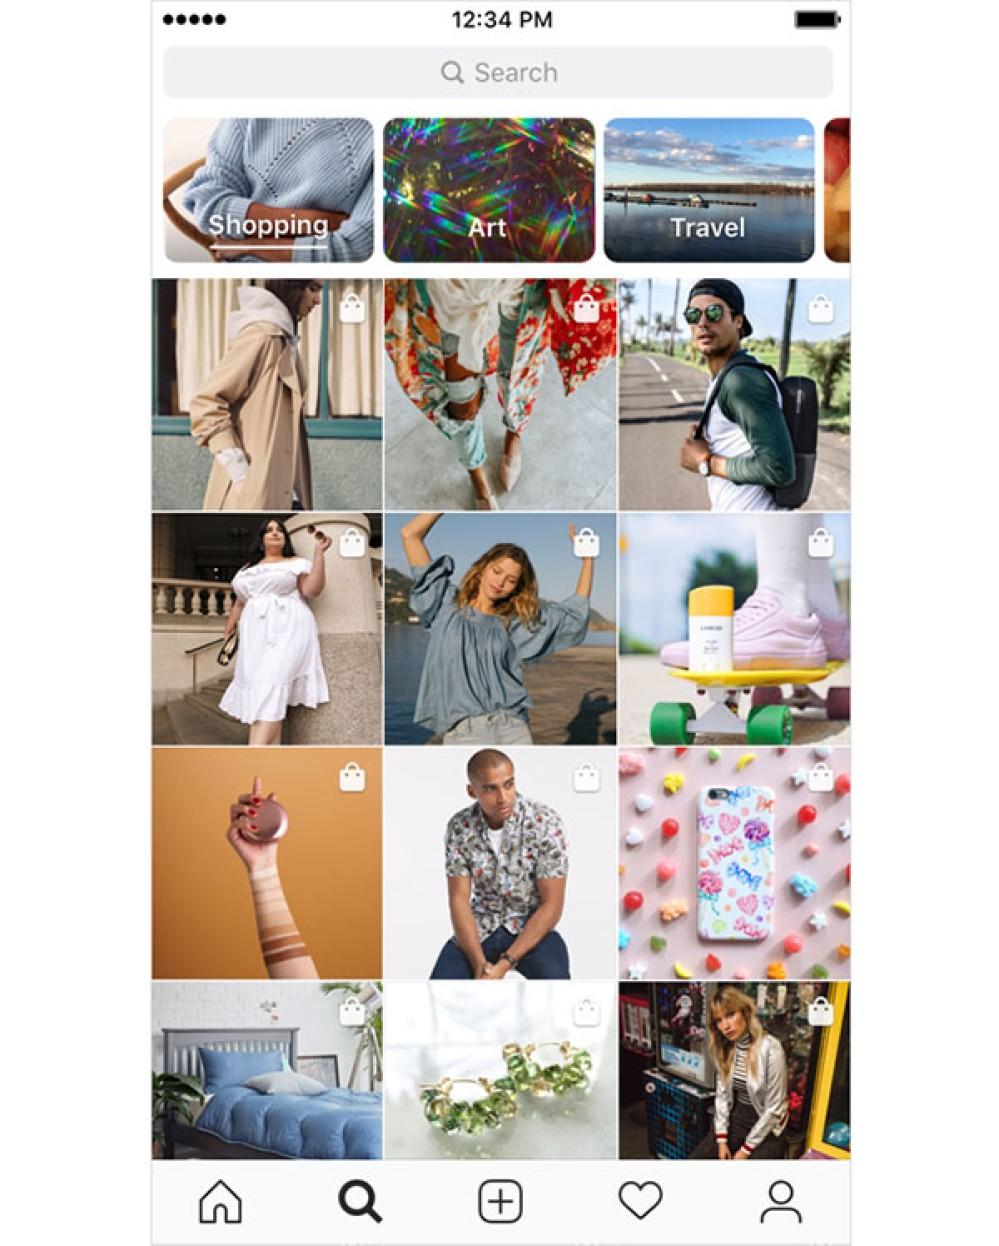 Instagram: Φέρνει την κατηγορία Shopping στην καρτέλα Explore και στα Stories